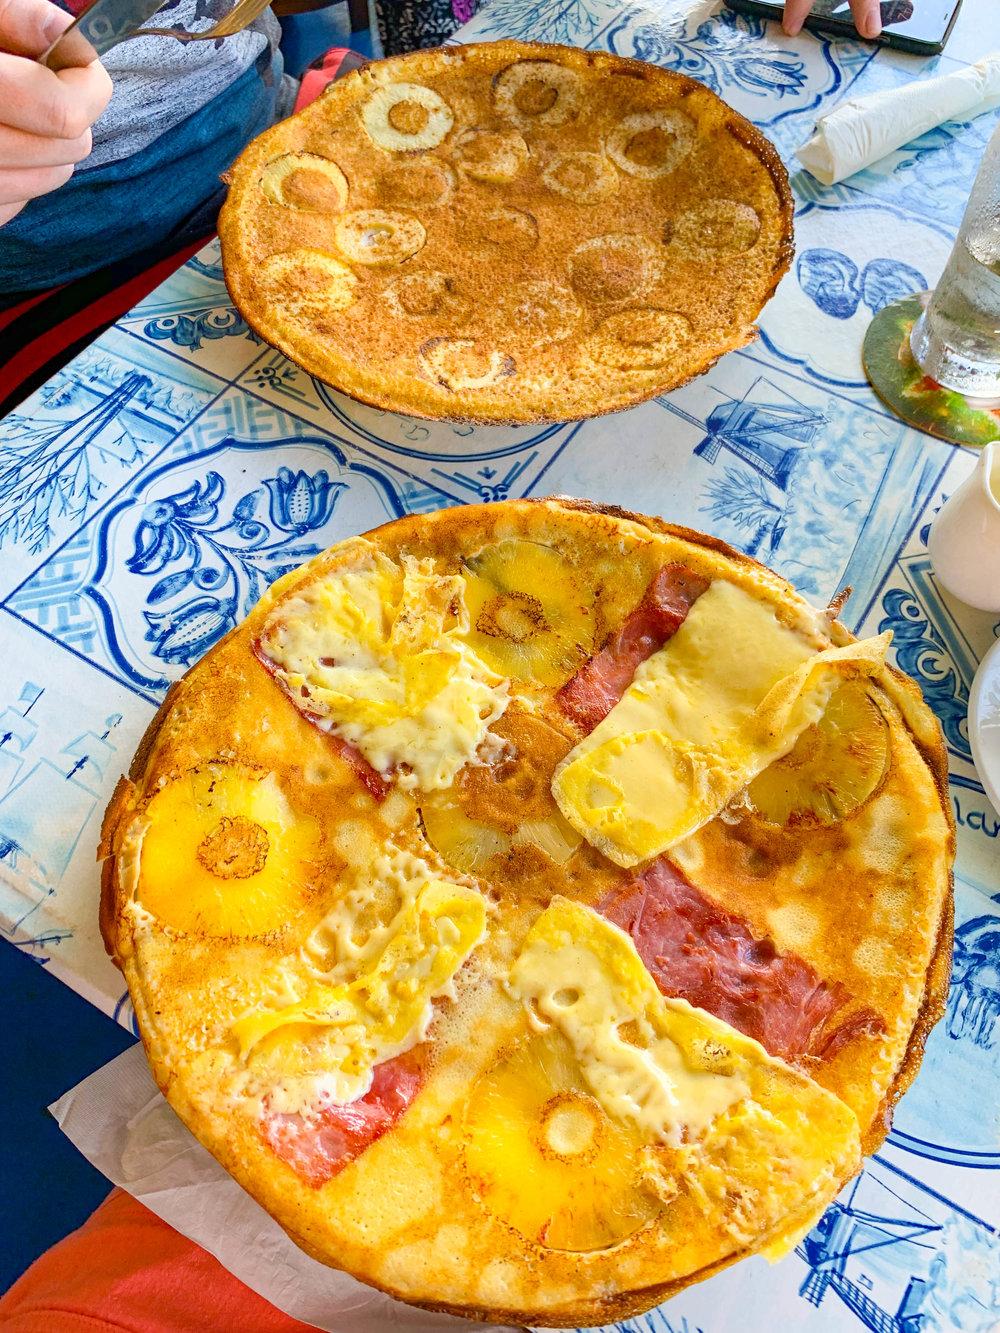 Diana's Pancake Place - Dutch Pancakes